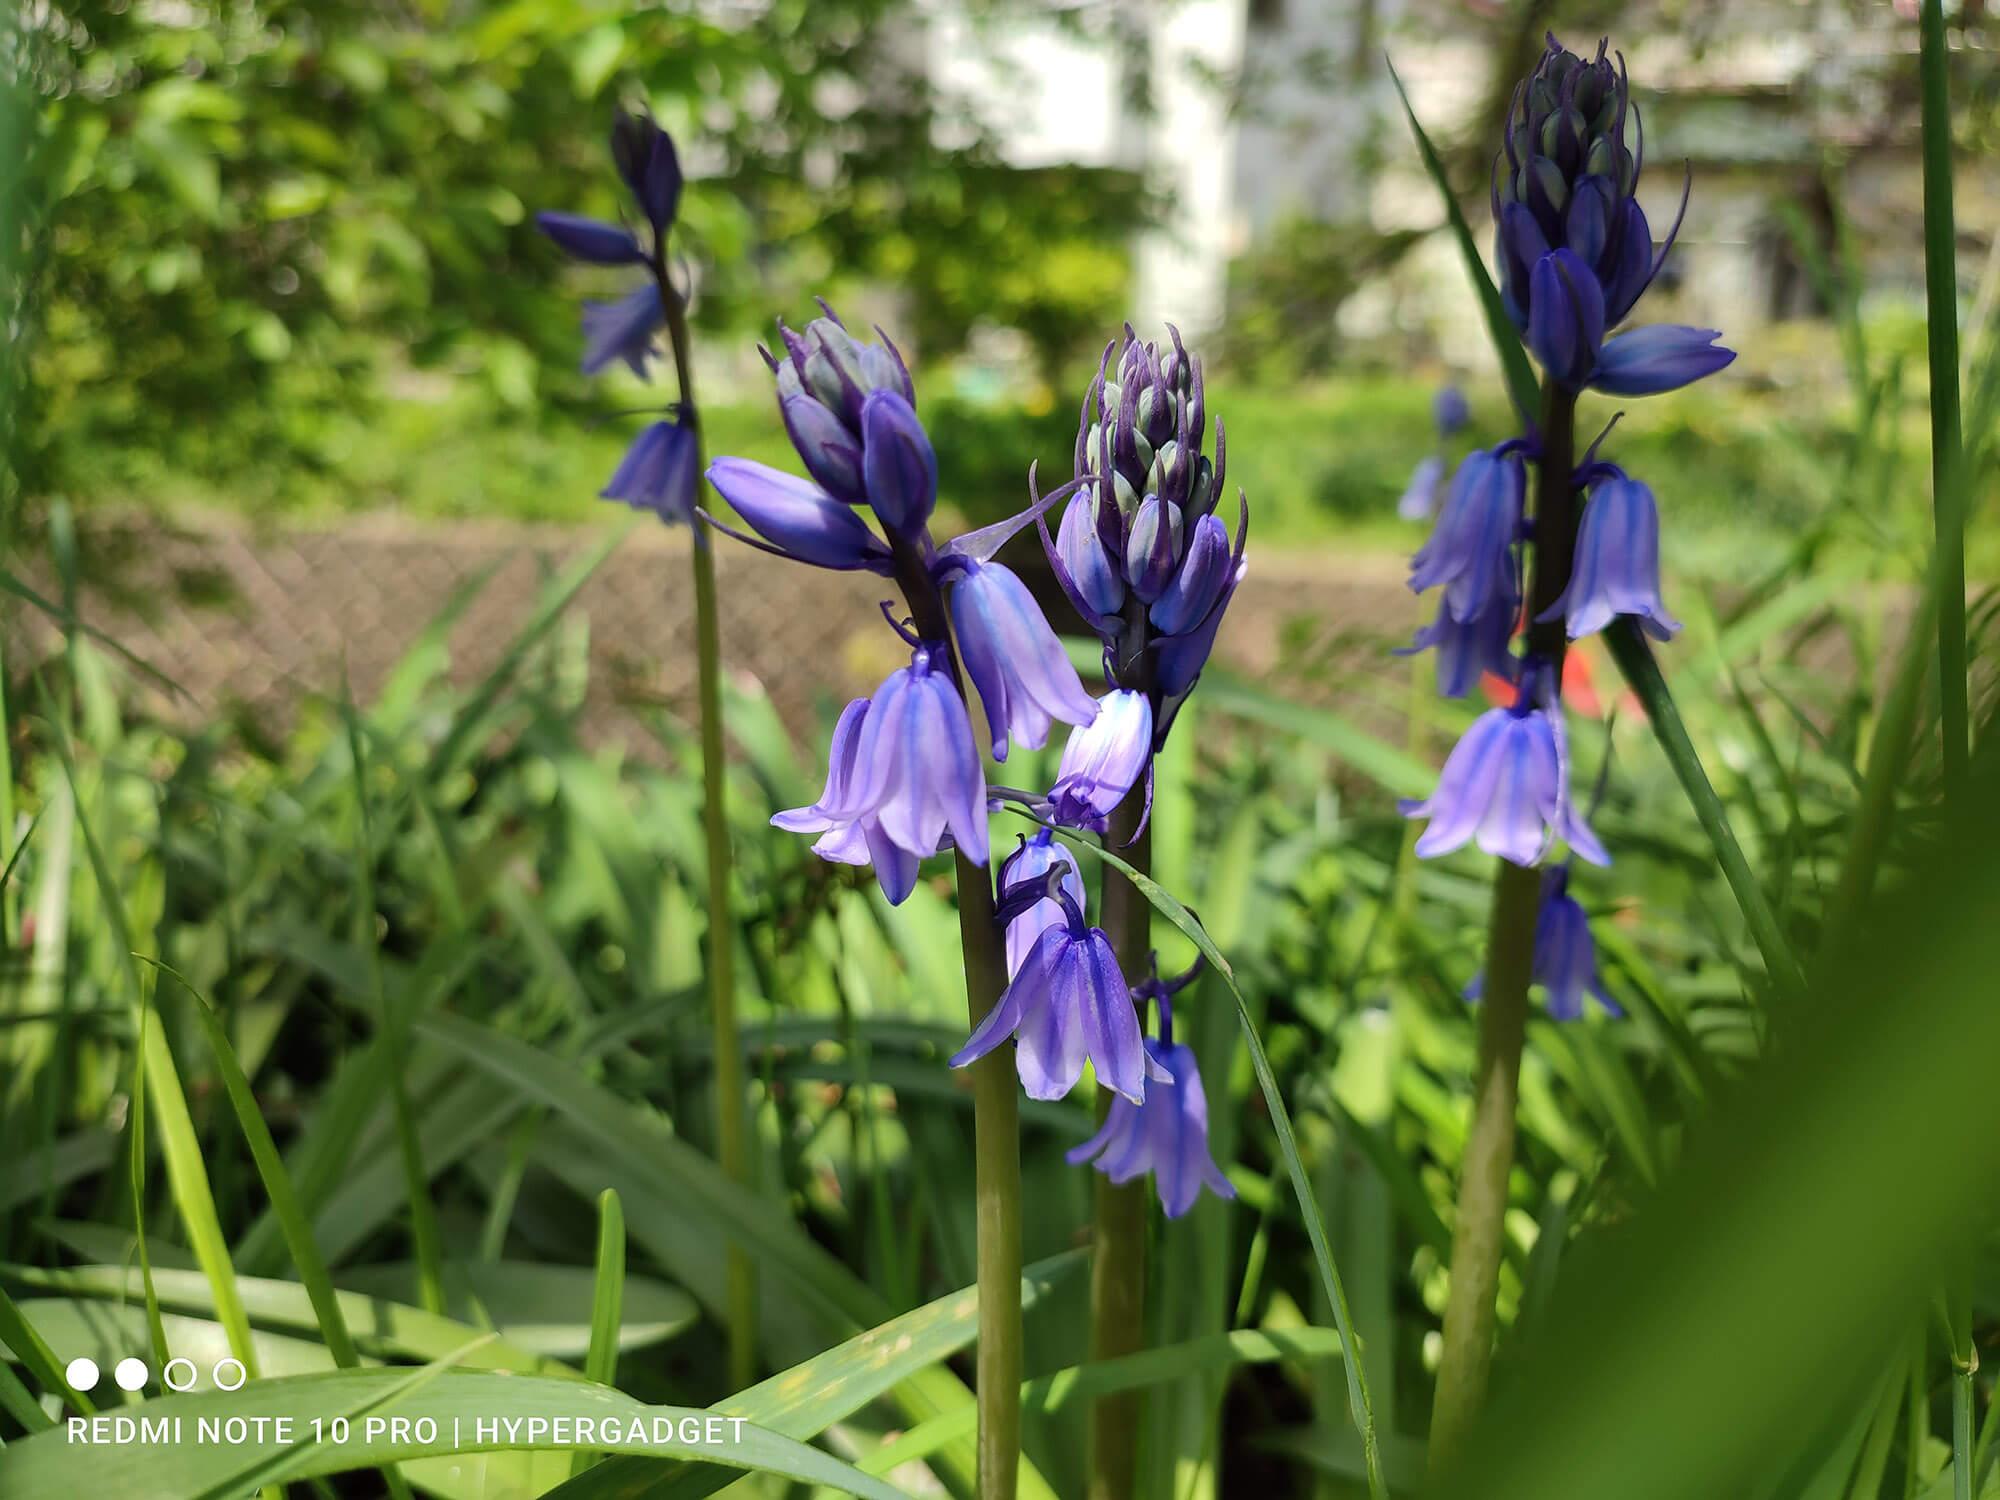 Redmi Note 10 Proのメインカメラで撮影した紫色の花の写真